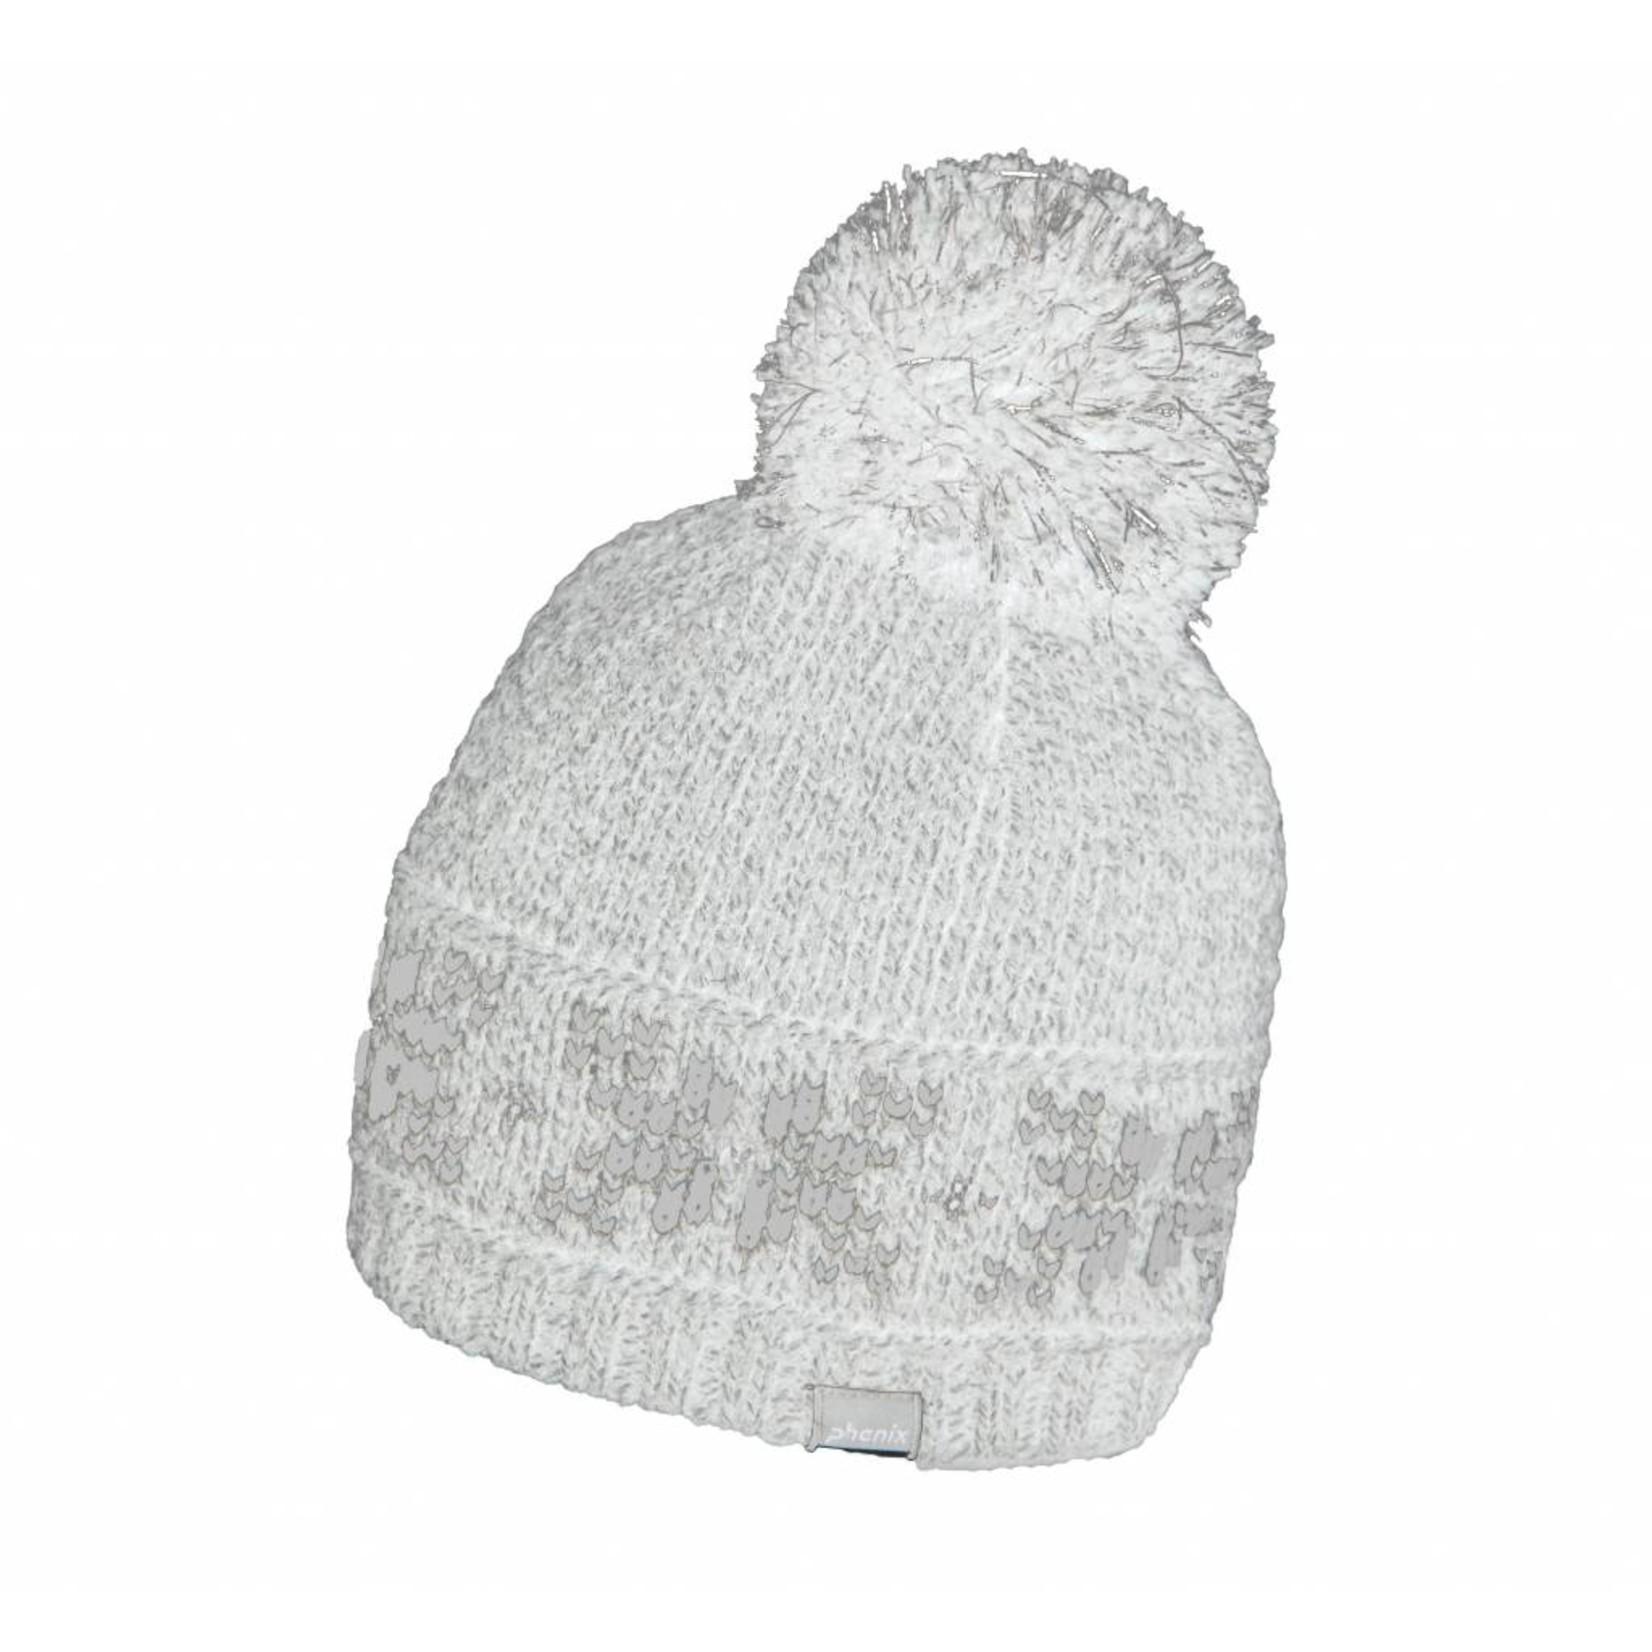 PHENIX Montbelo Knit Hat with Pon-Pon